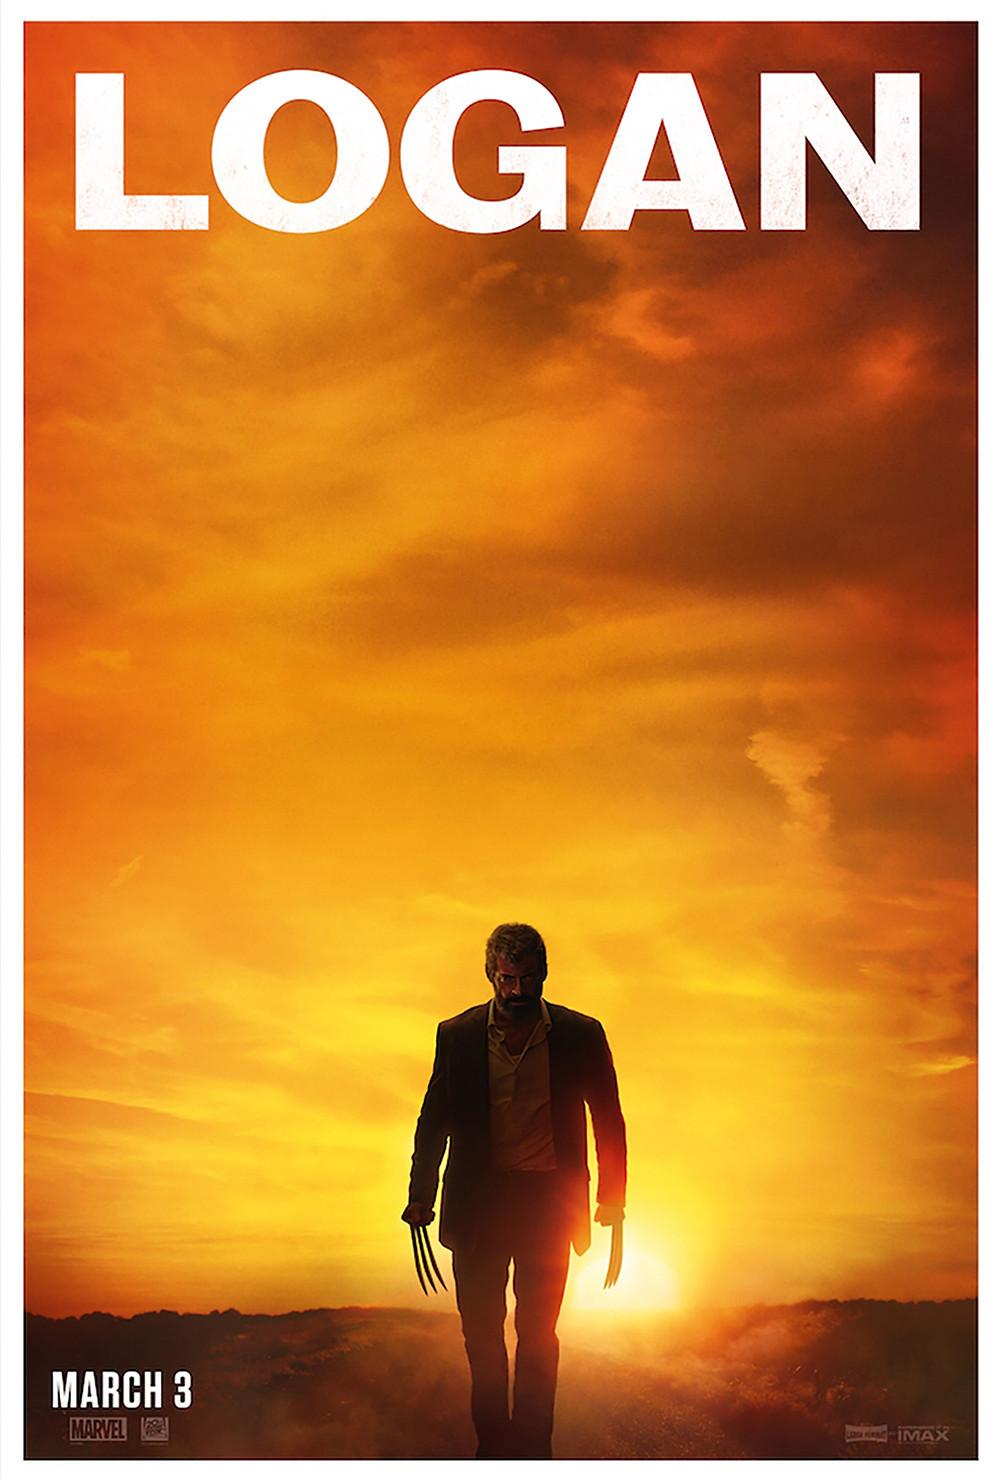 Logan poster trailer